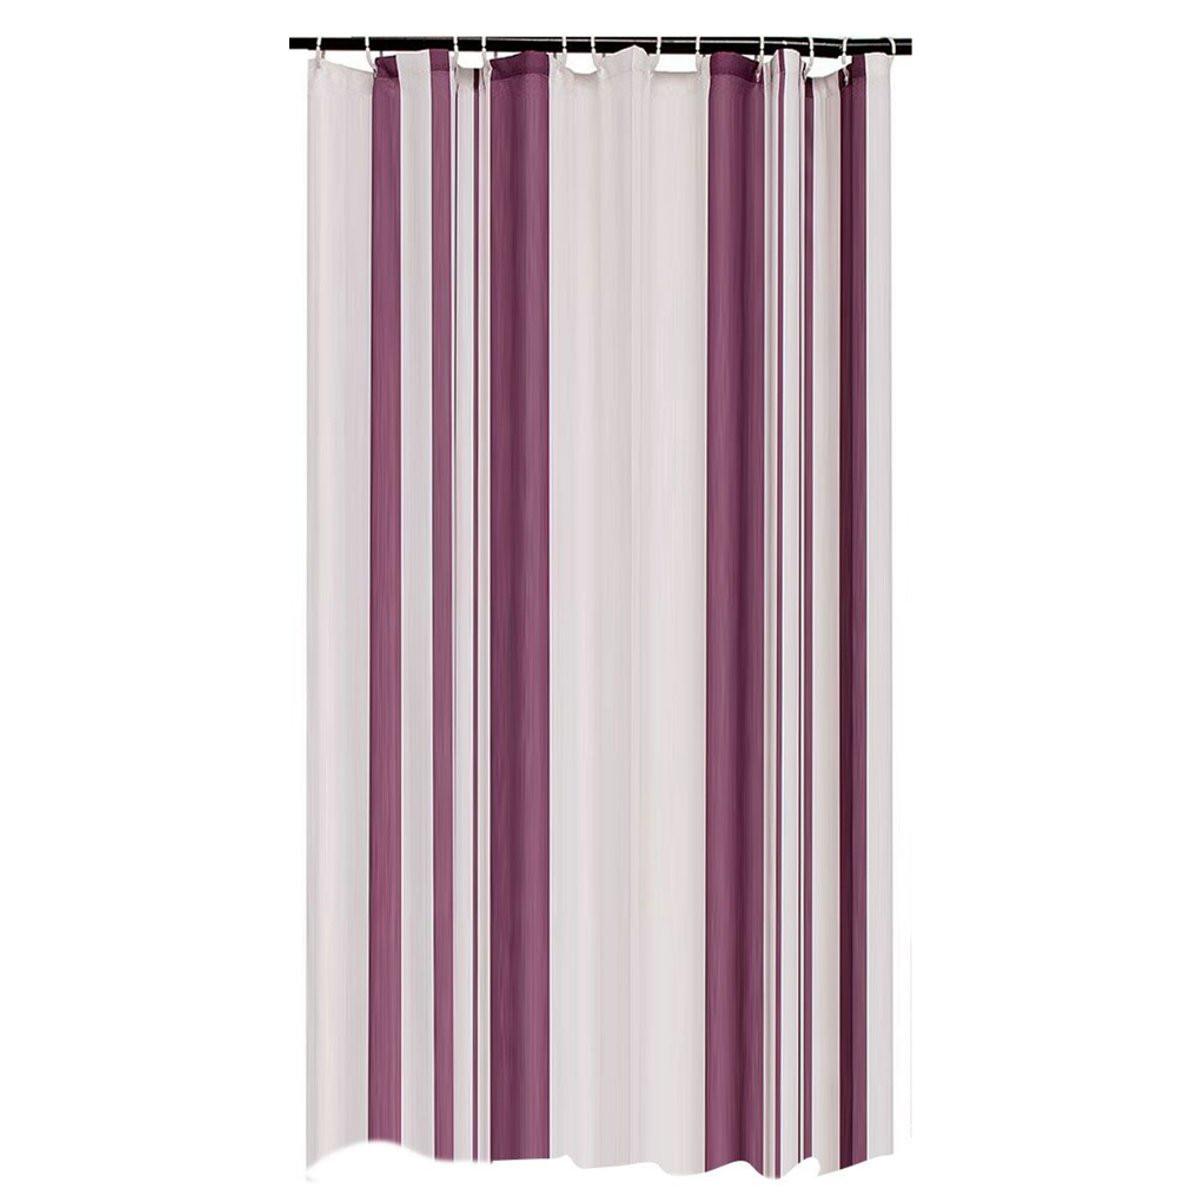 Cortinas De Baño Artesanales:Púrpura Rayas Diseño A Prueba de agua Cortina de Ducha de Poliéster